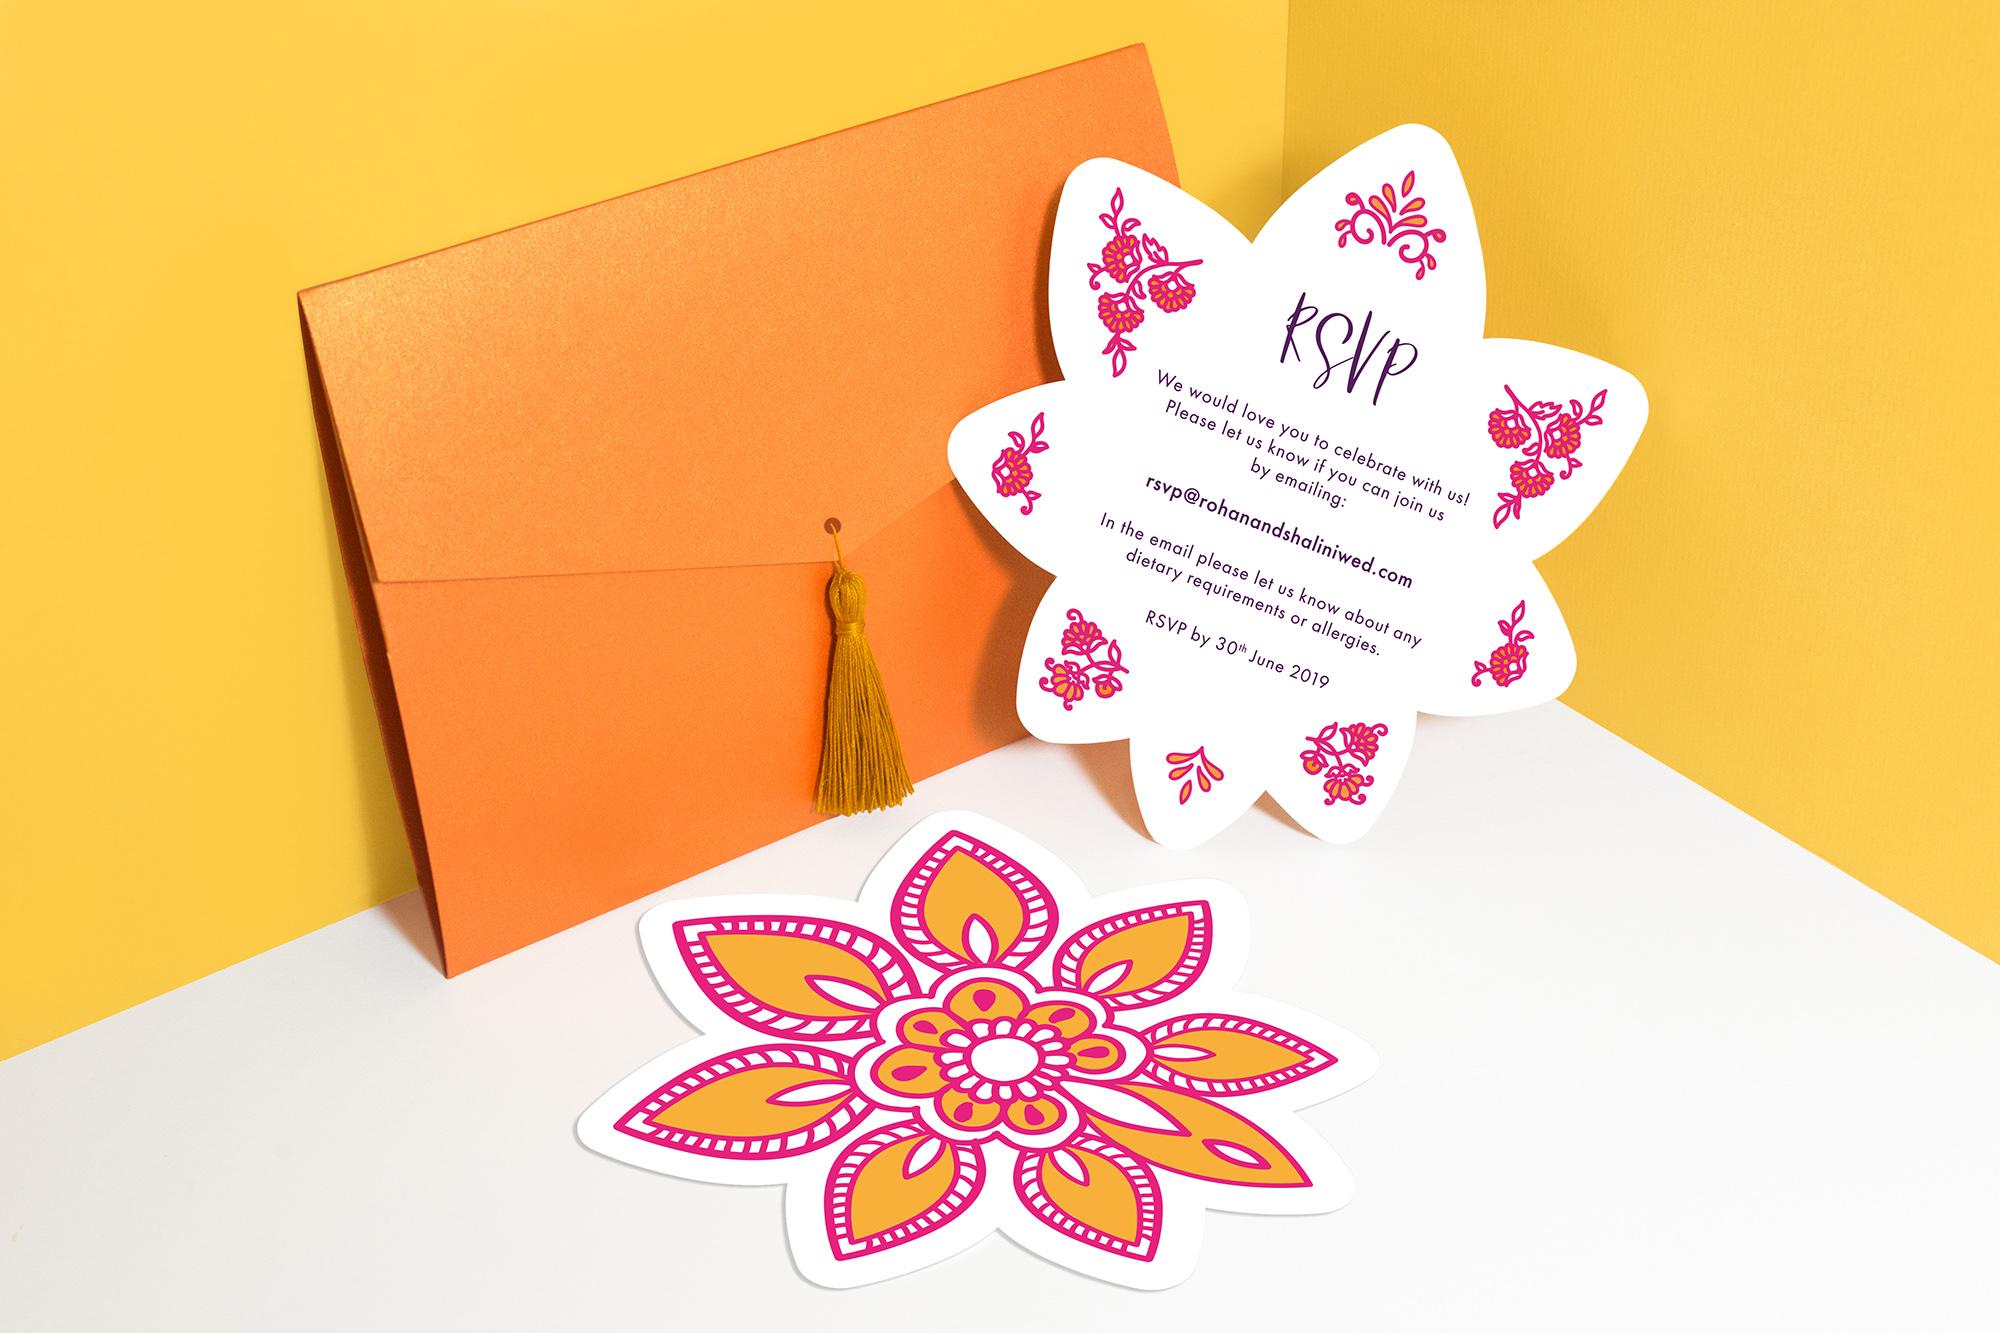 Modern Indian Inspired, untraditional, wedding stationary invitation design die cut RSVP with tassel